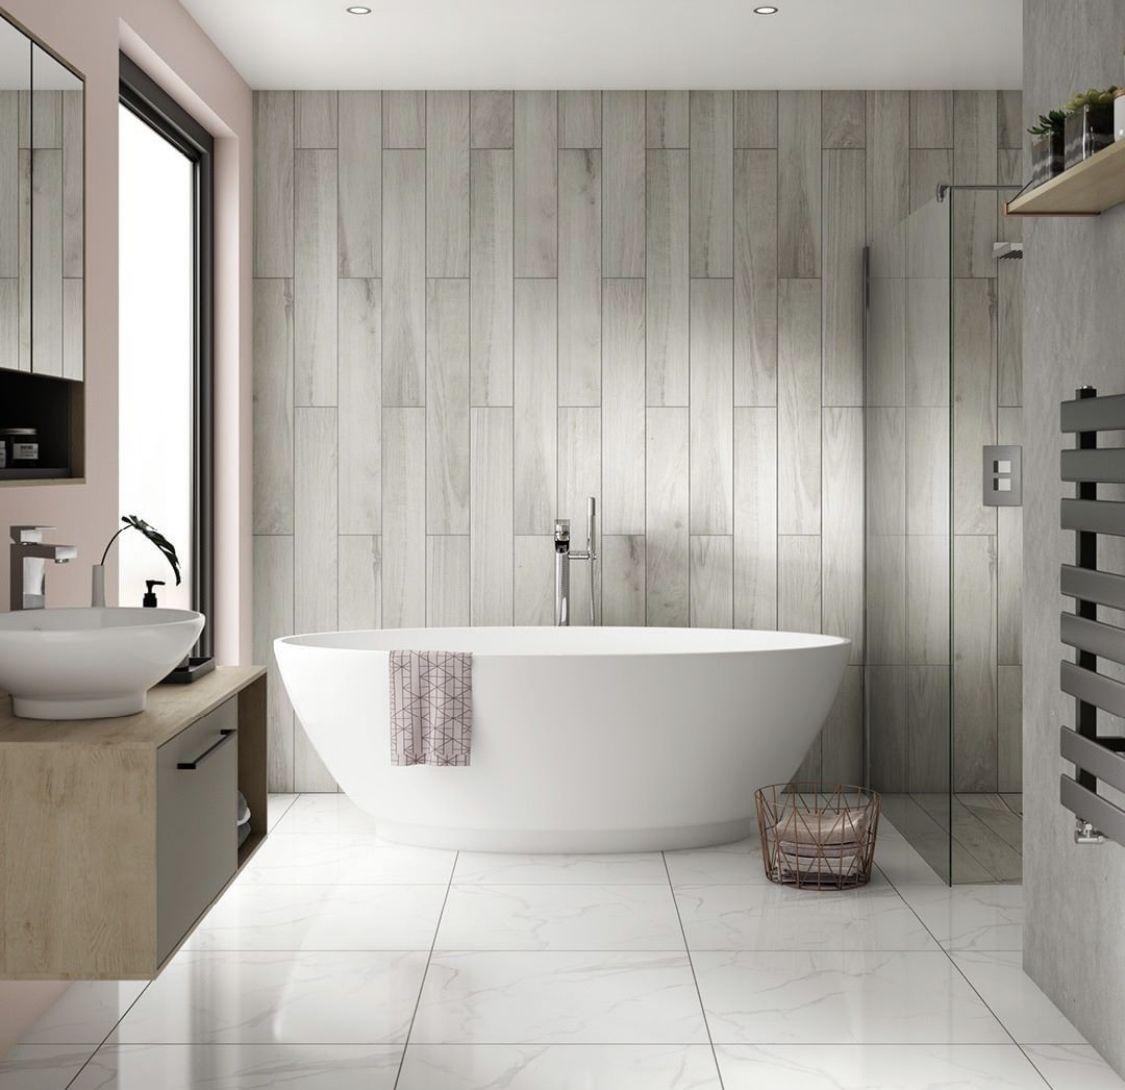 Pin By M Callanan On Our Dream Home Clophill Bathroom Tile Designs Modern Bathroom Tile Update Small Bathroom